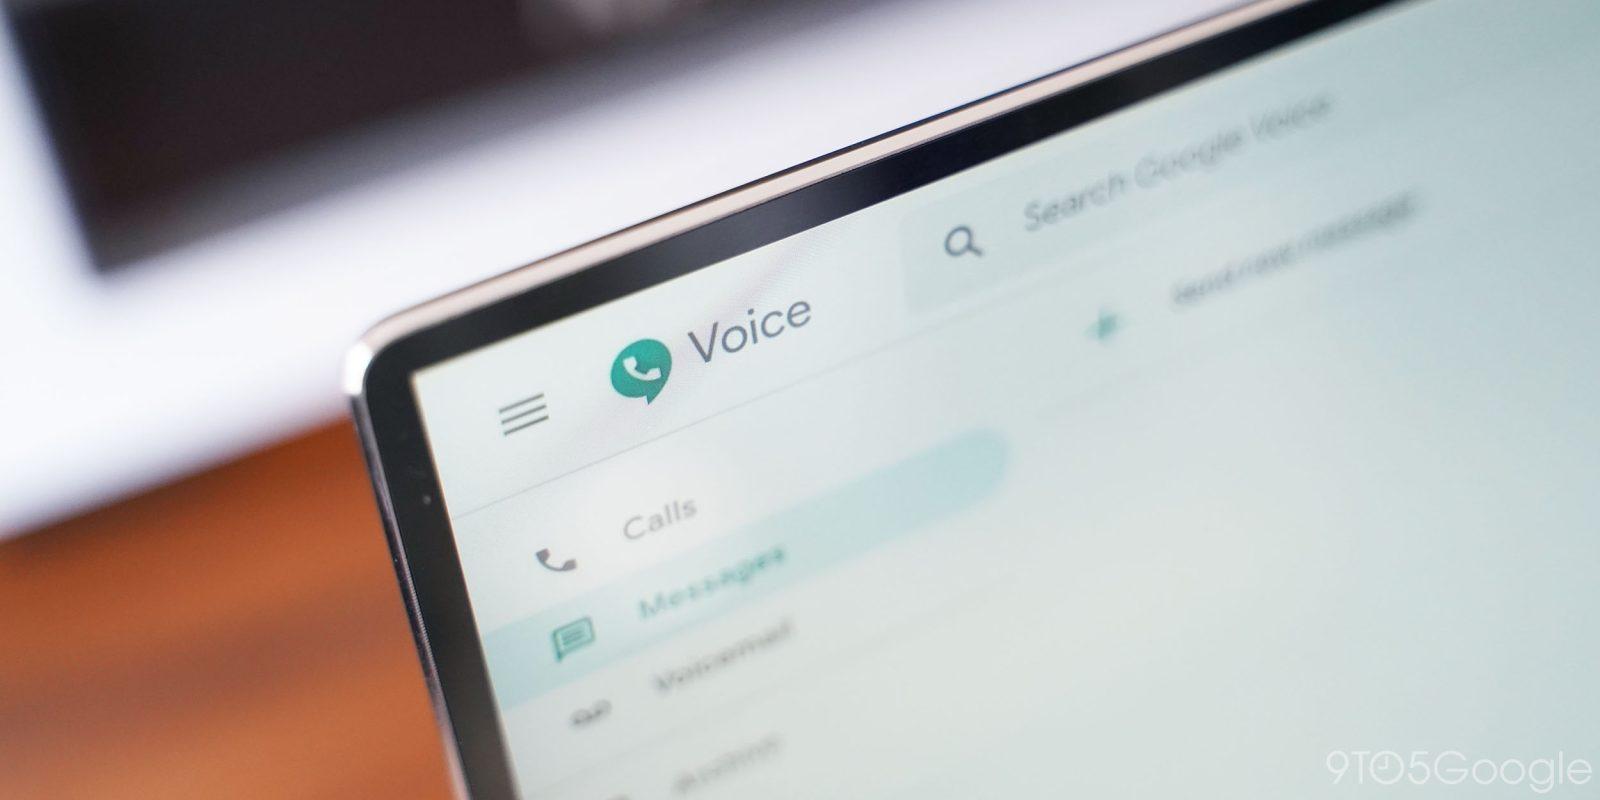 Google Voice web app gains always-visible call panel, audio controls